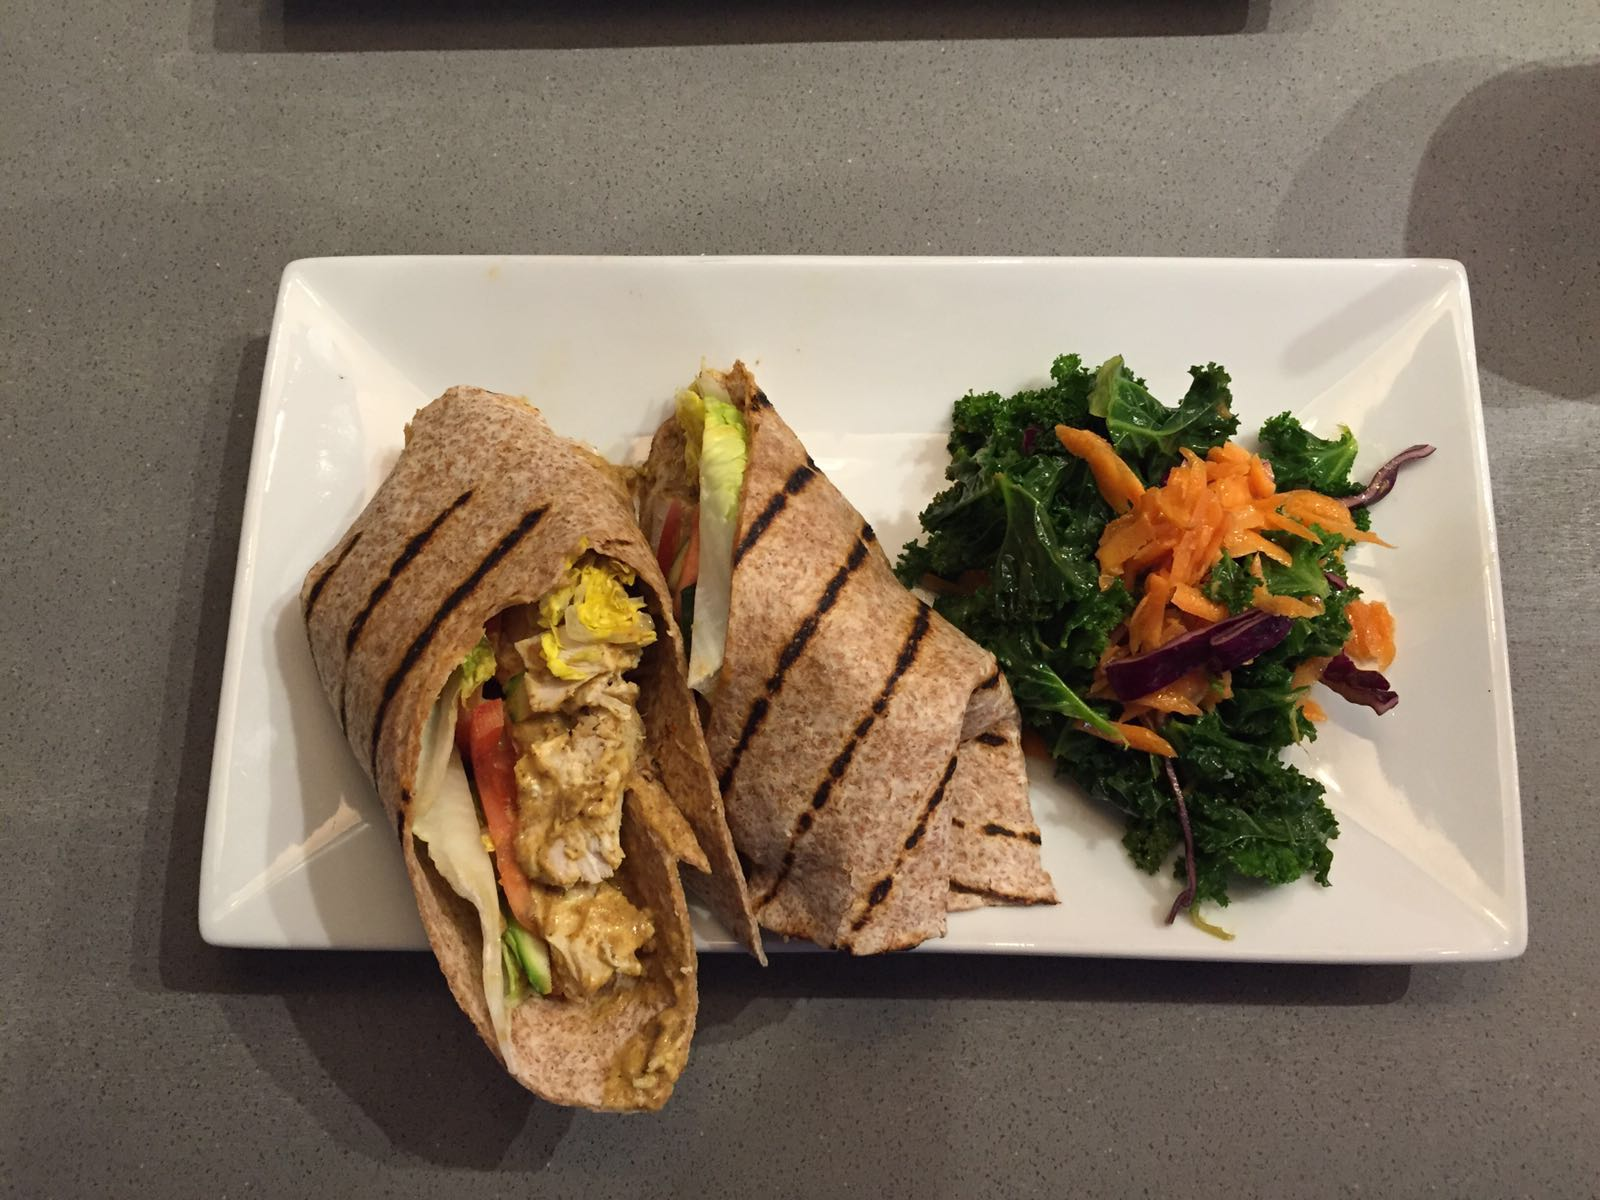 glasgow foods restaurant review april 2016